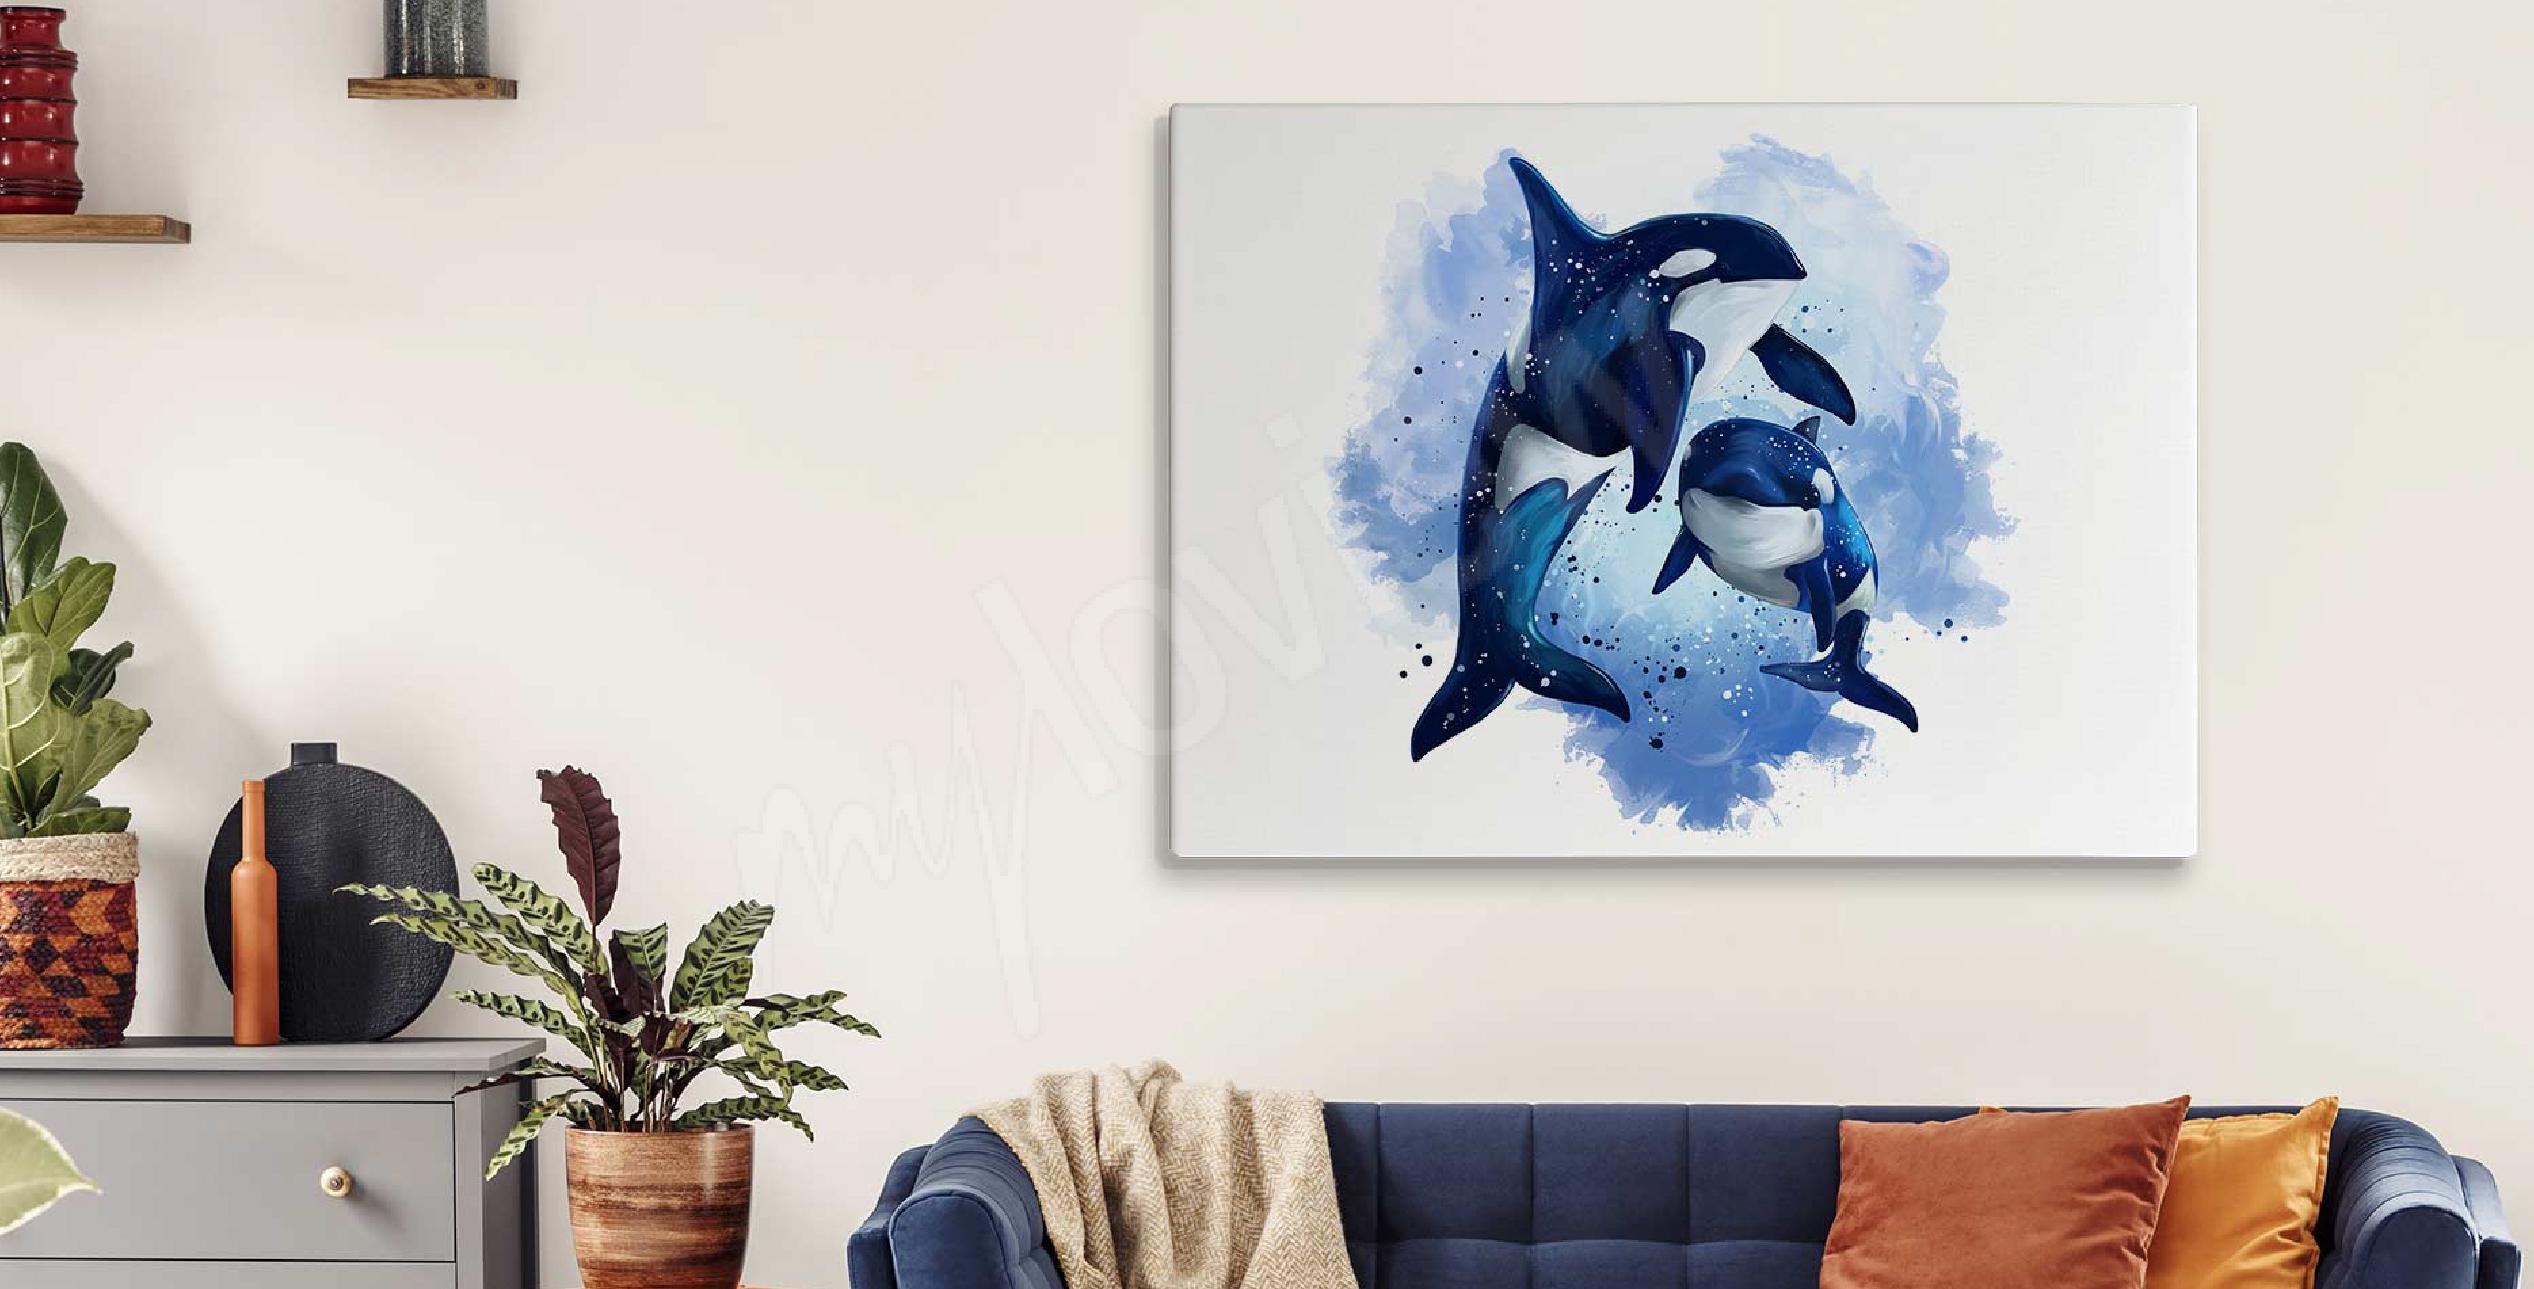 Image aquarelle et dauphins